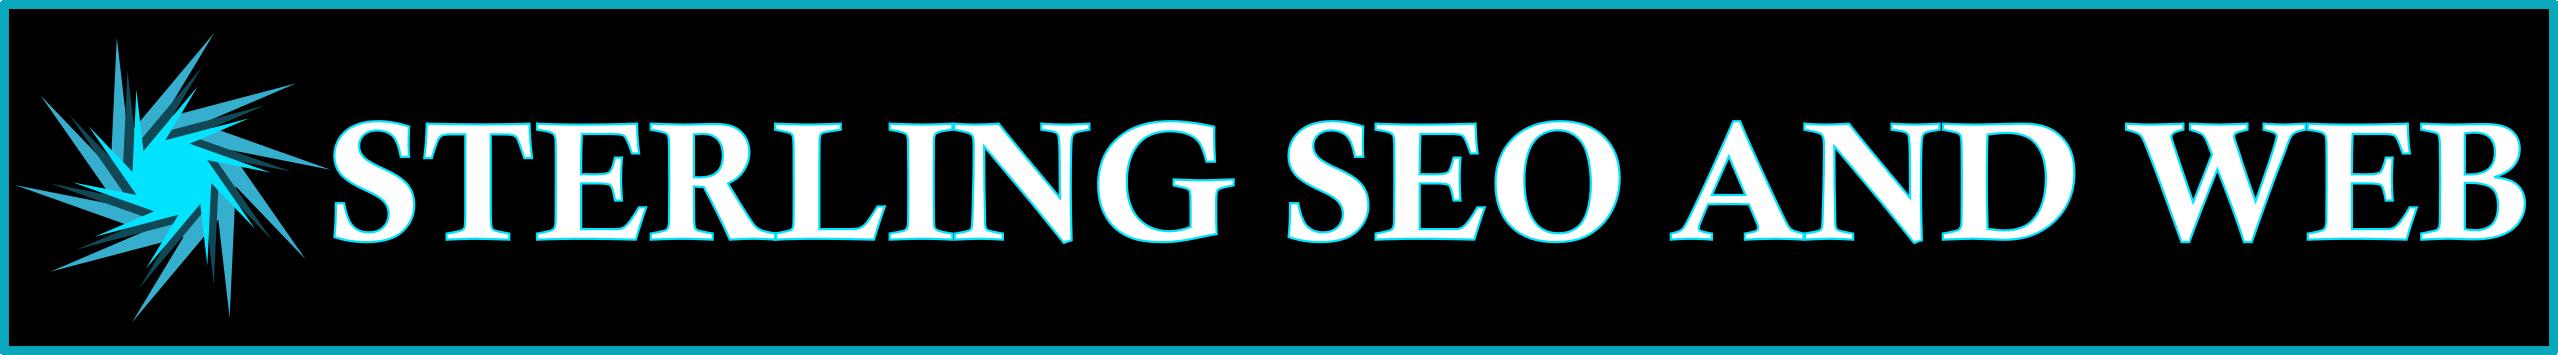 SEO and Web Design | Sterling SEO and WEB | Stuart, Florida